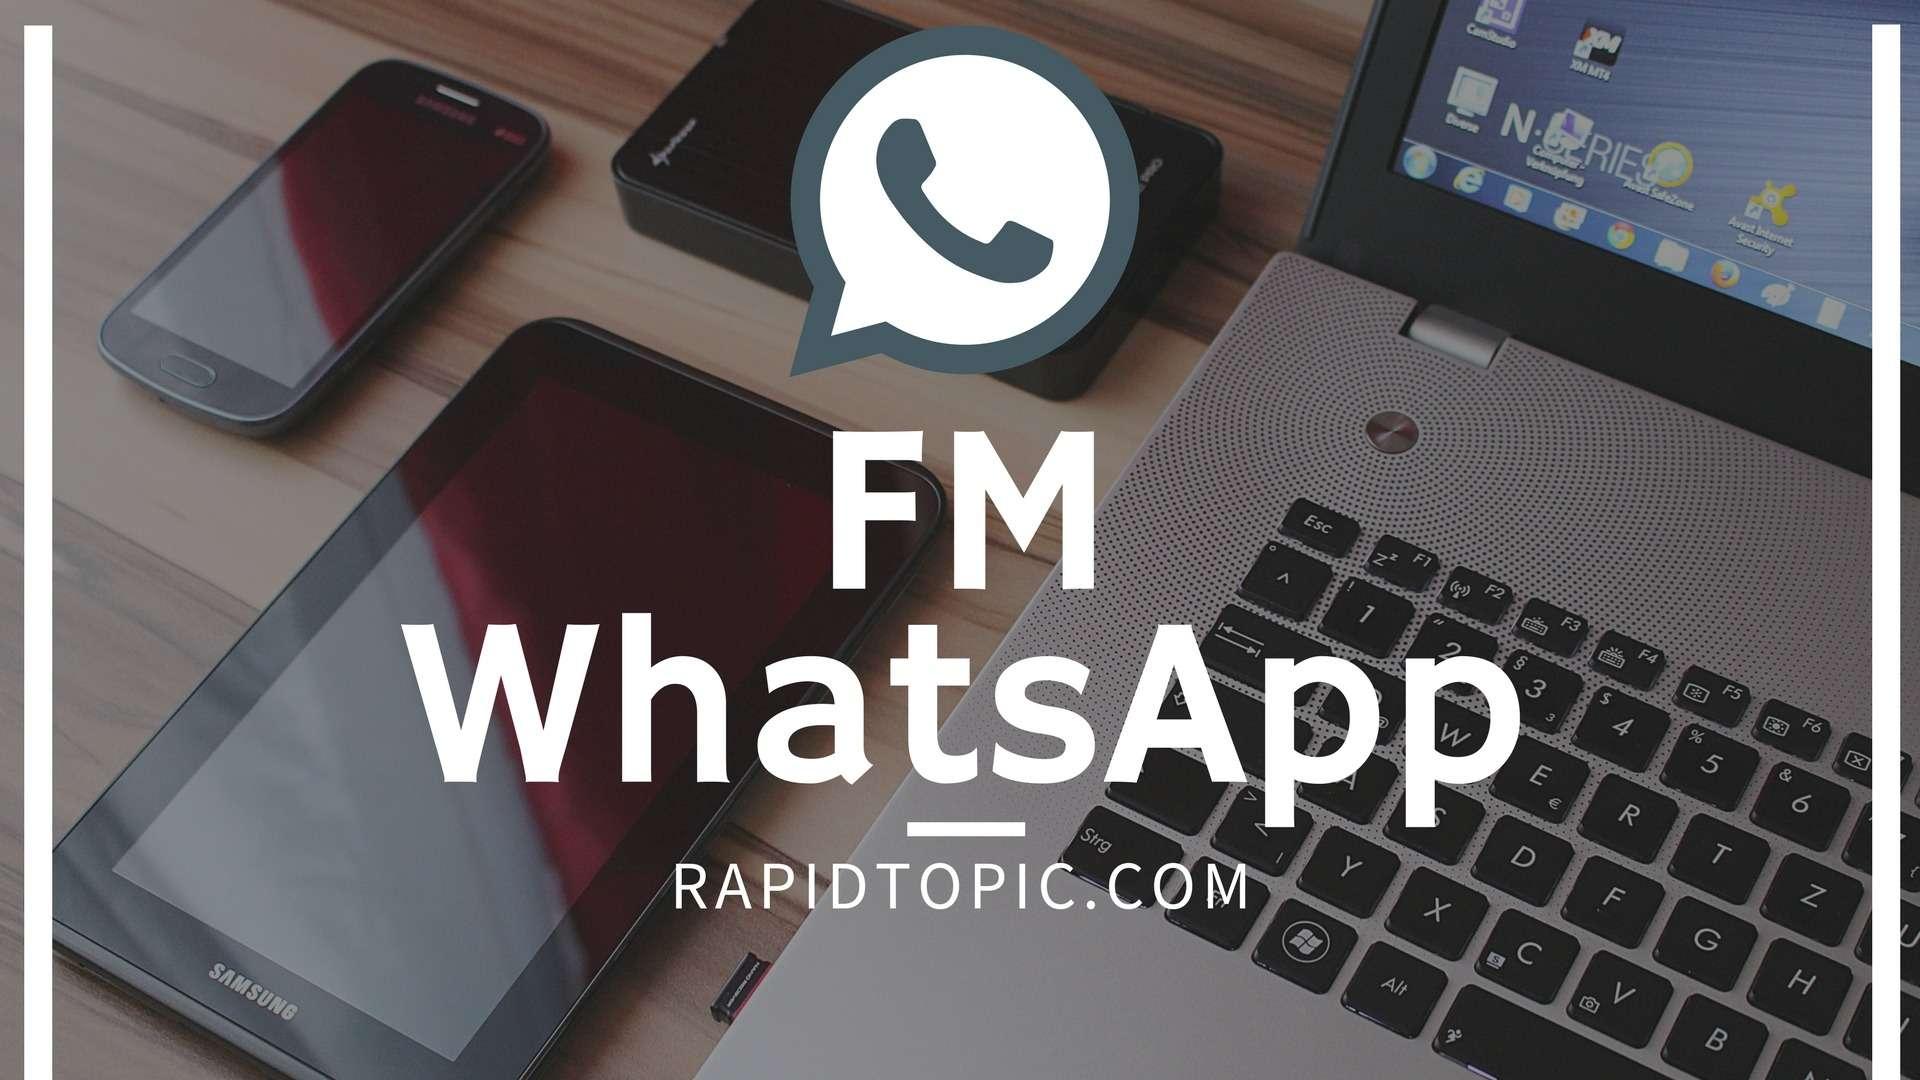 FM whatsapp apk moded